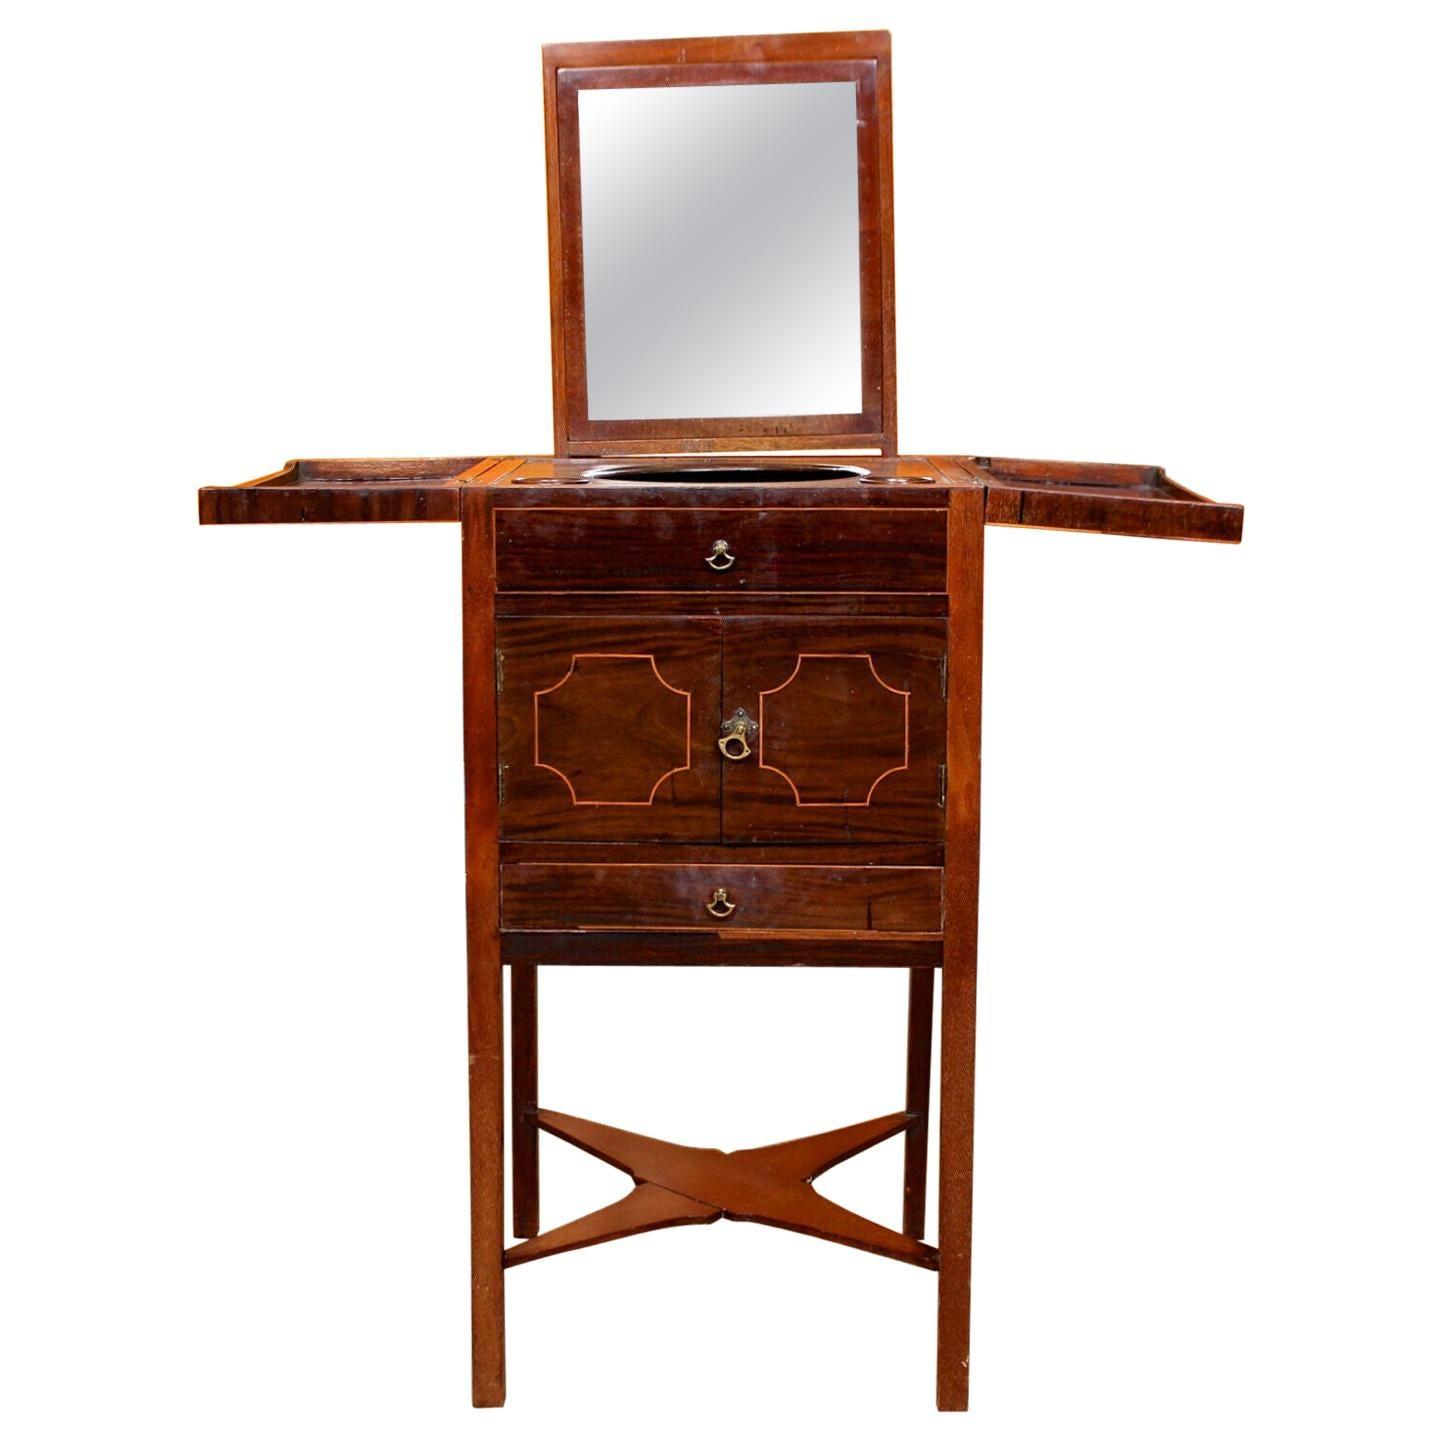 Antique Washstand Shaving Vanity Mirror Stand C1780 Mahogany Bathroom Cabinet